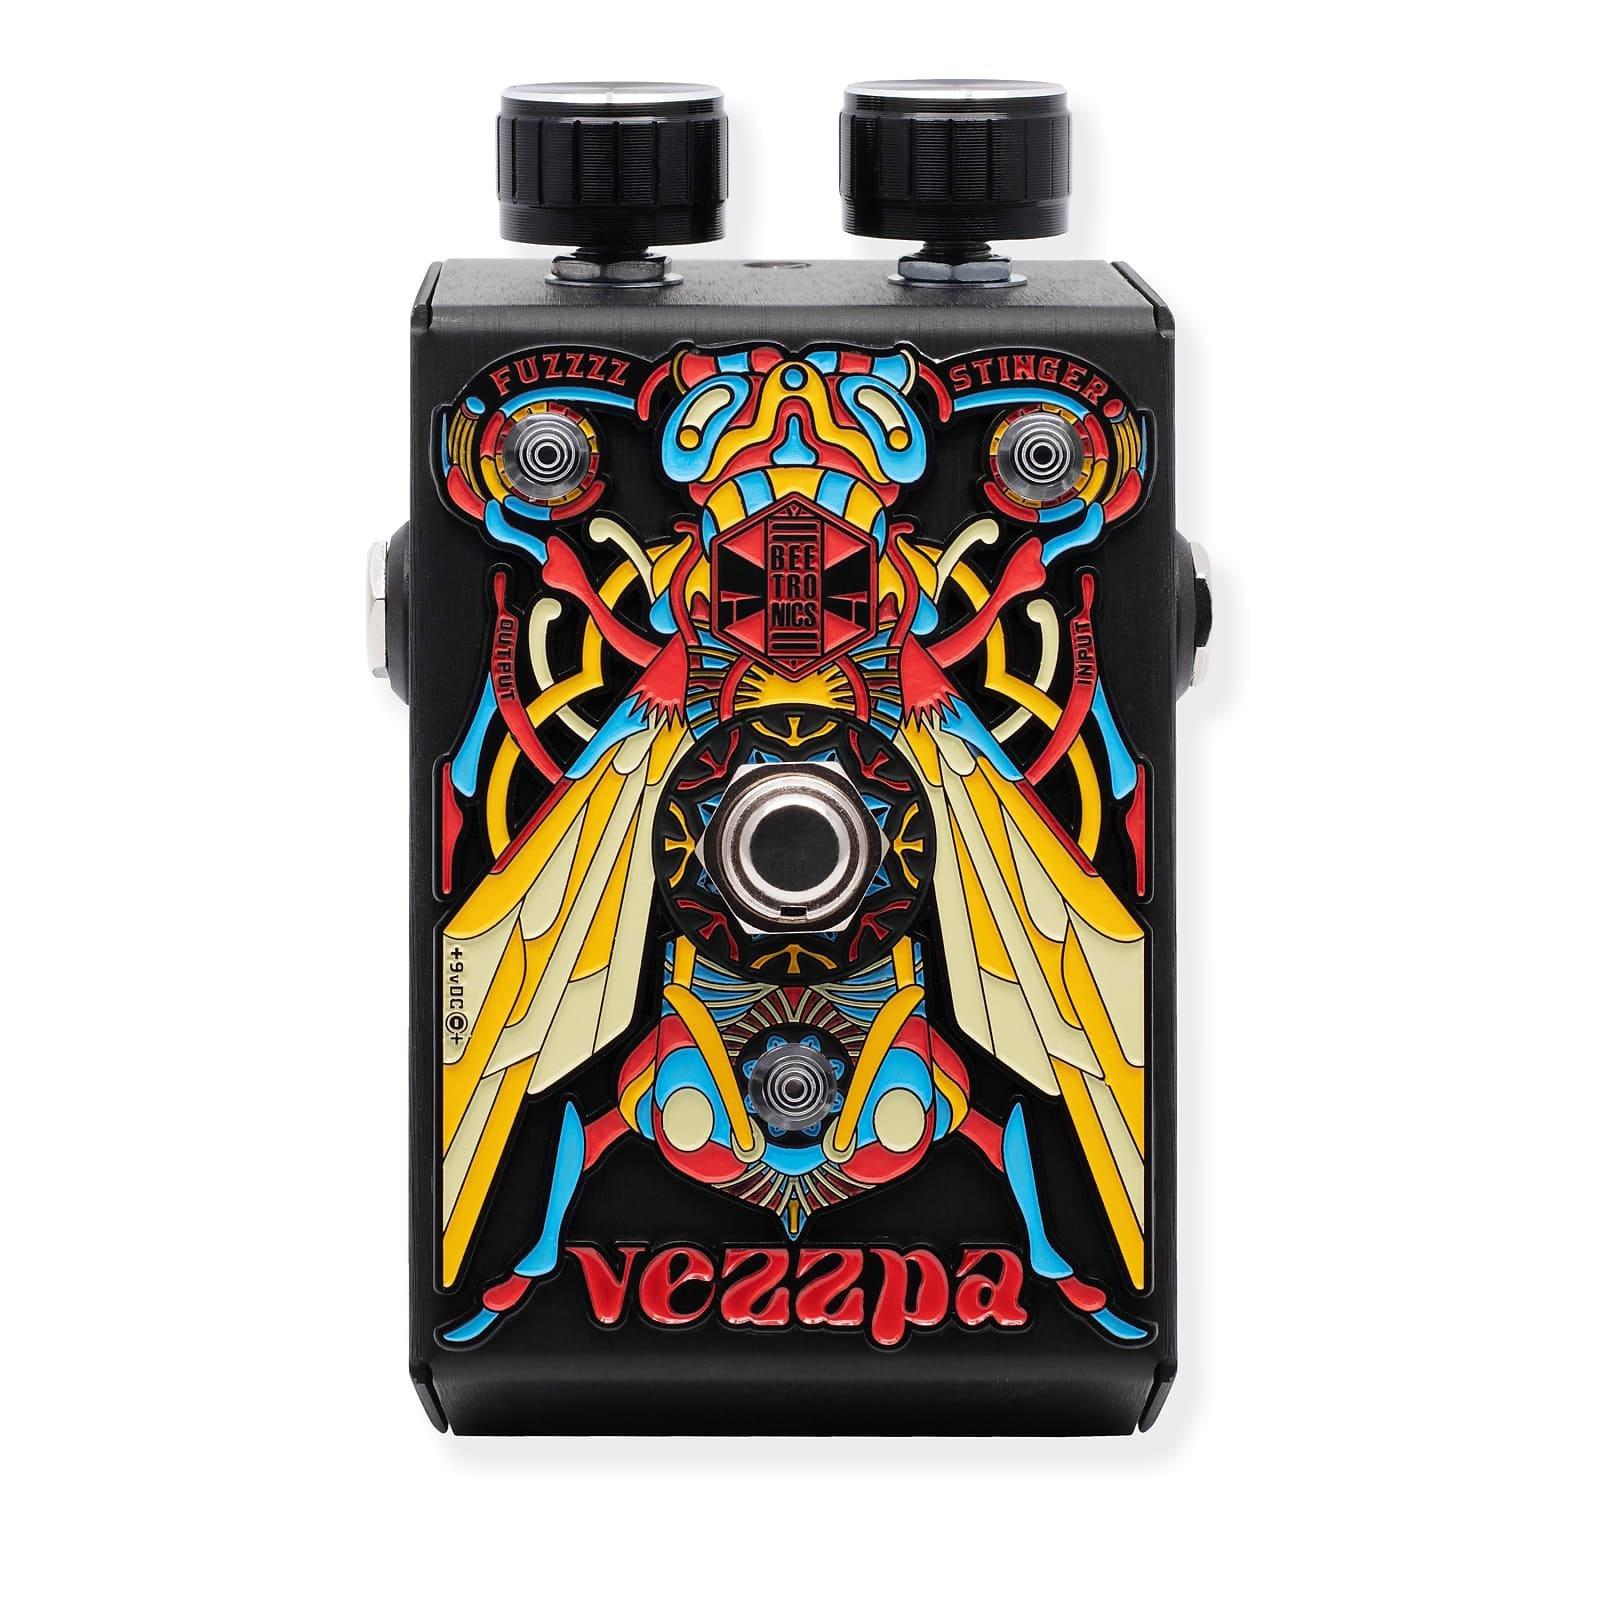 Beetronics Vezzpa Octave Stinger